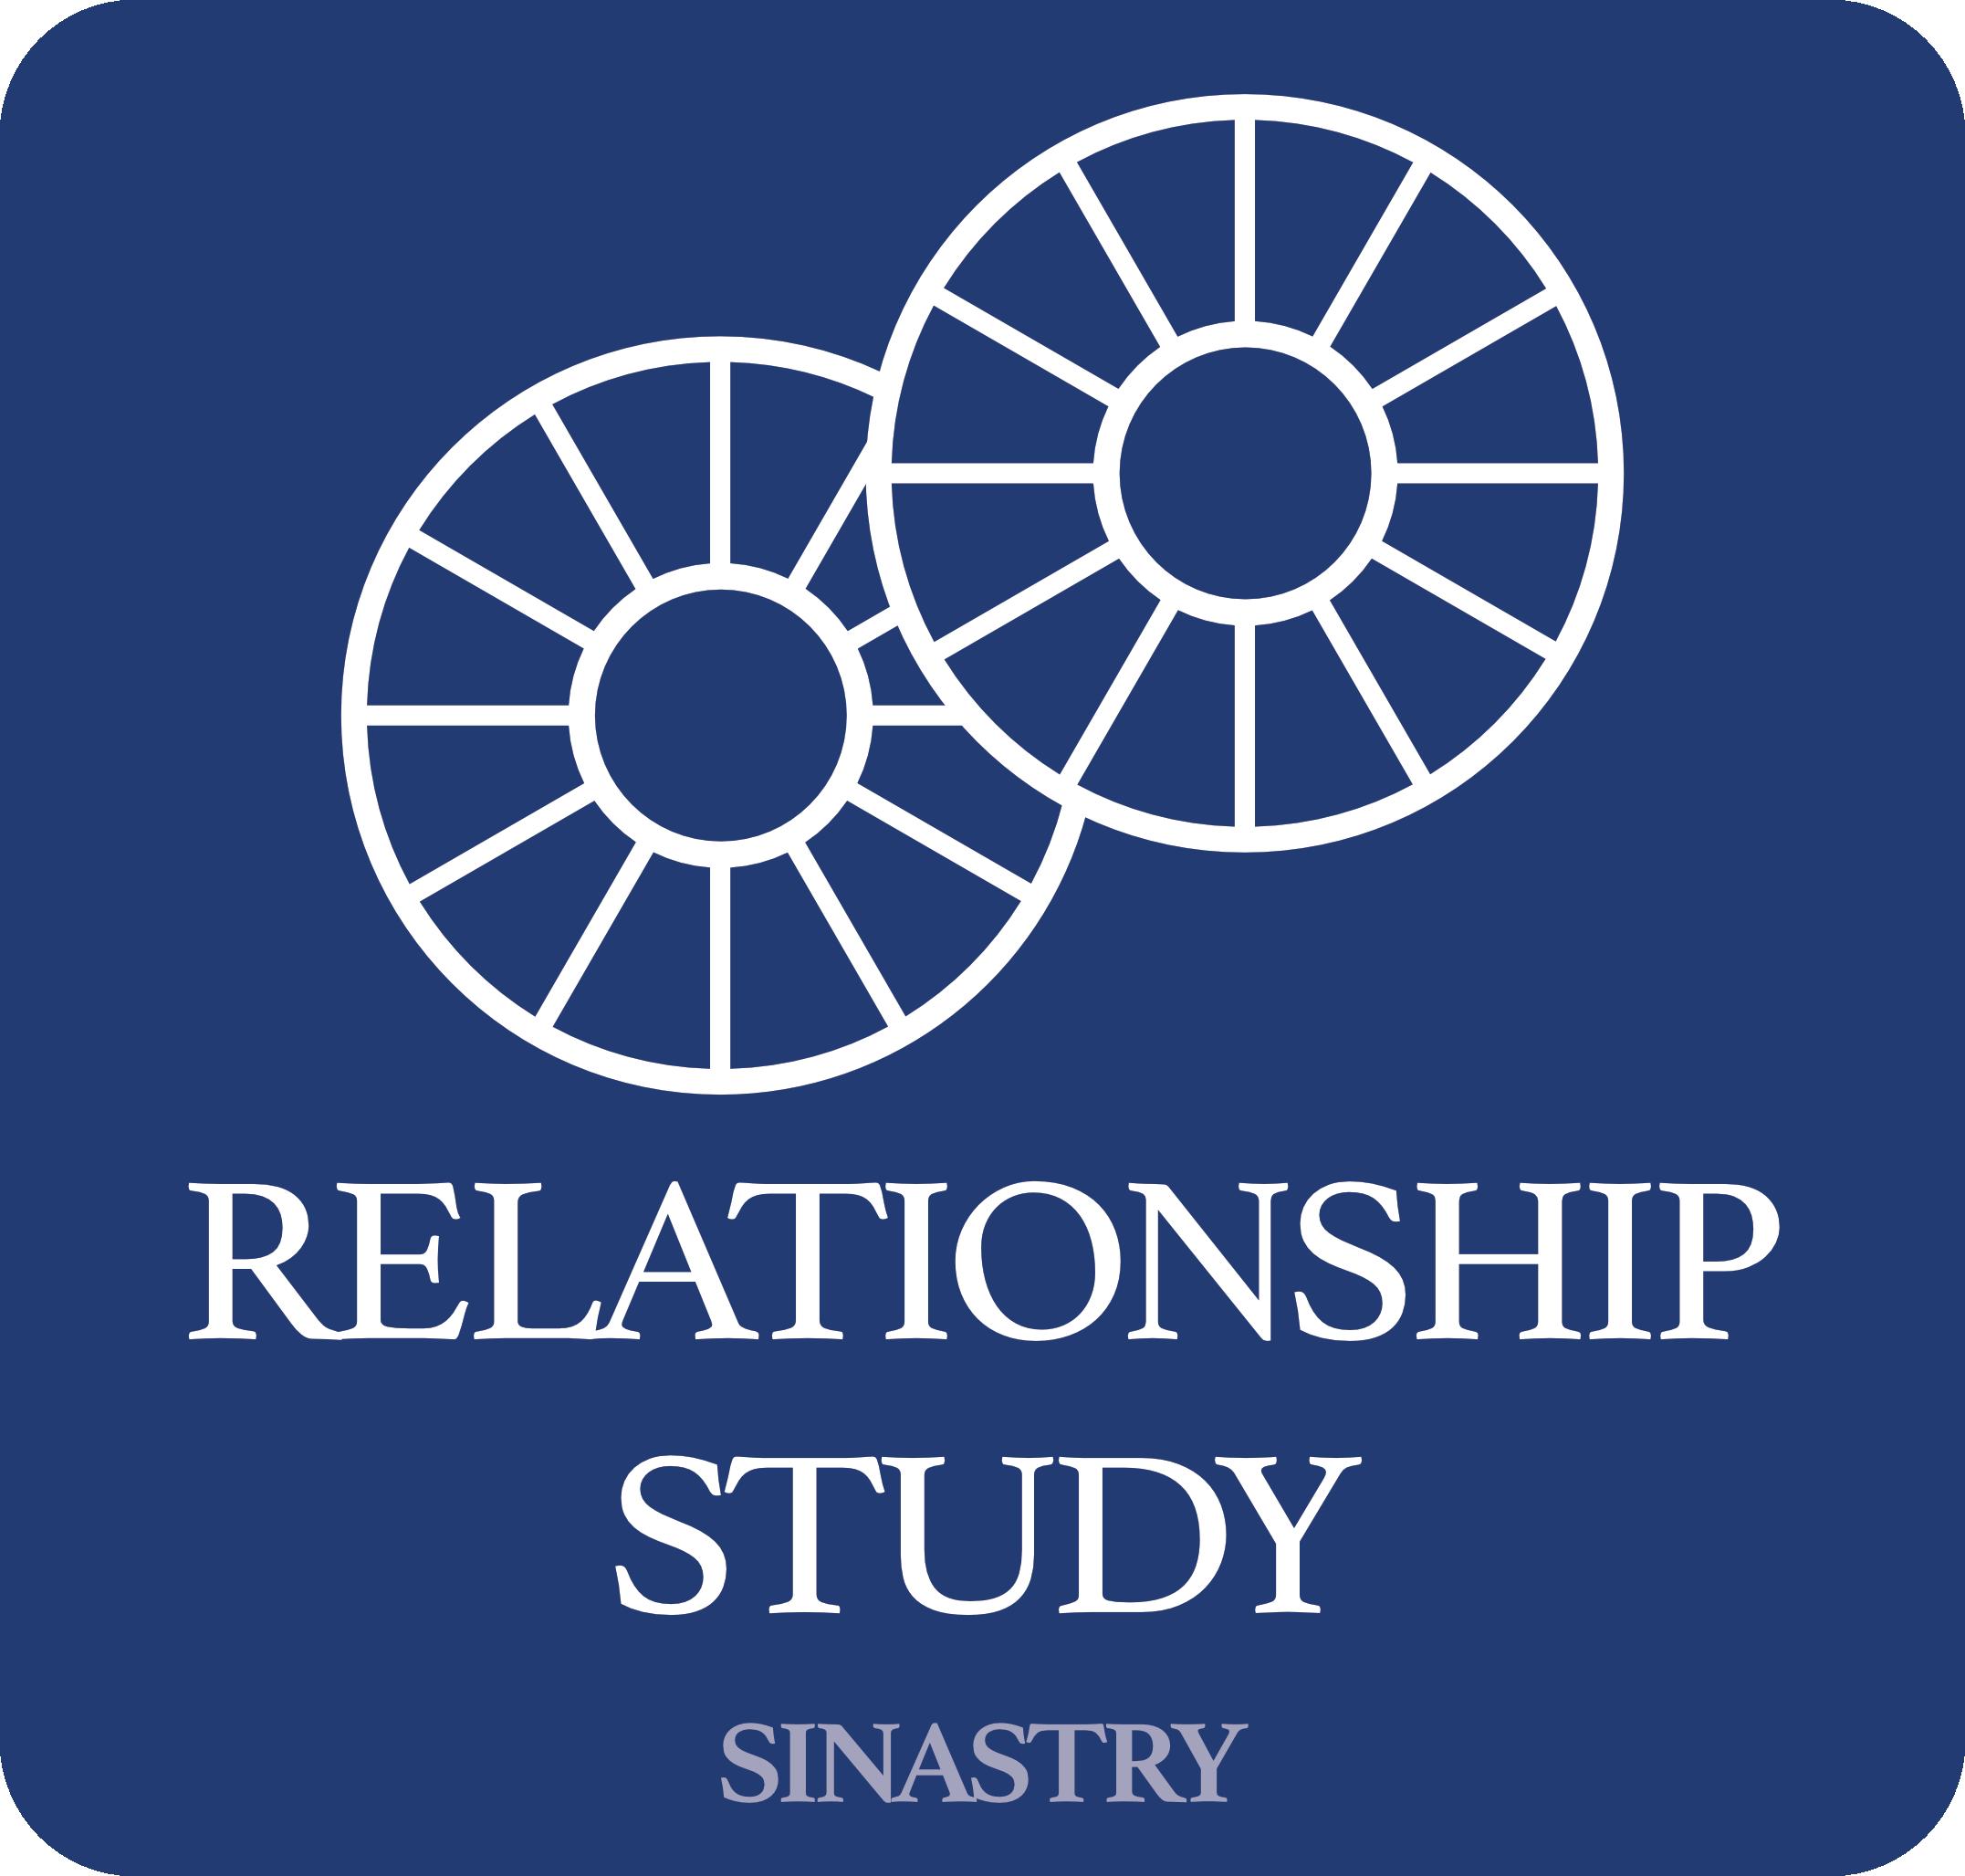 Relationship Study (Sinastry)